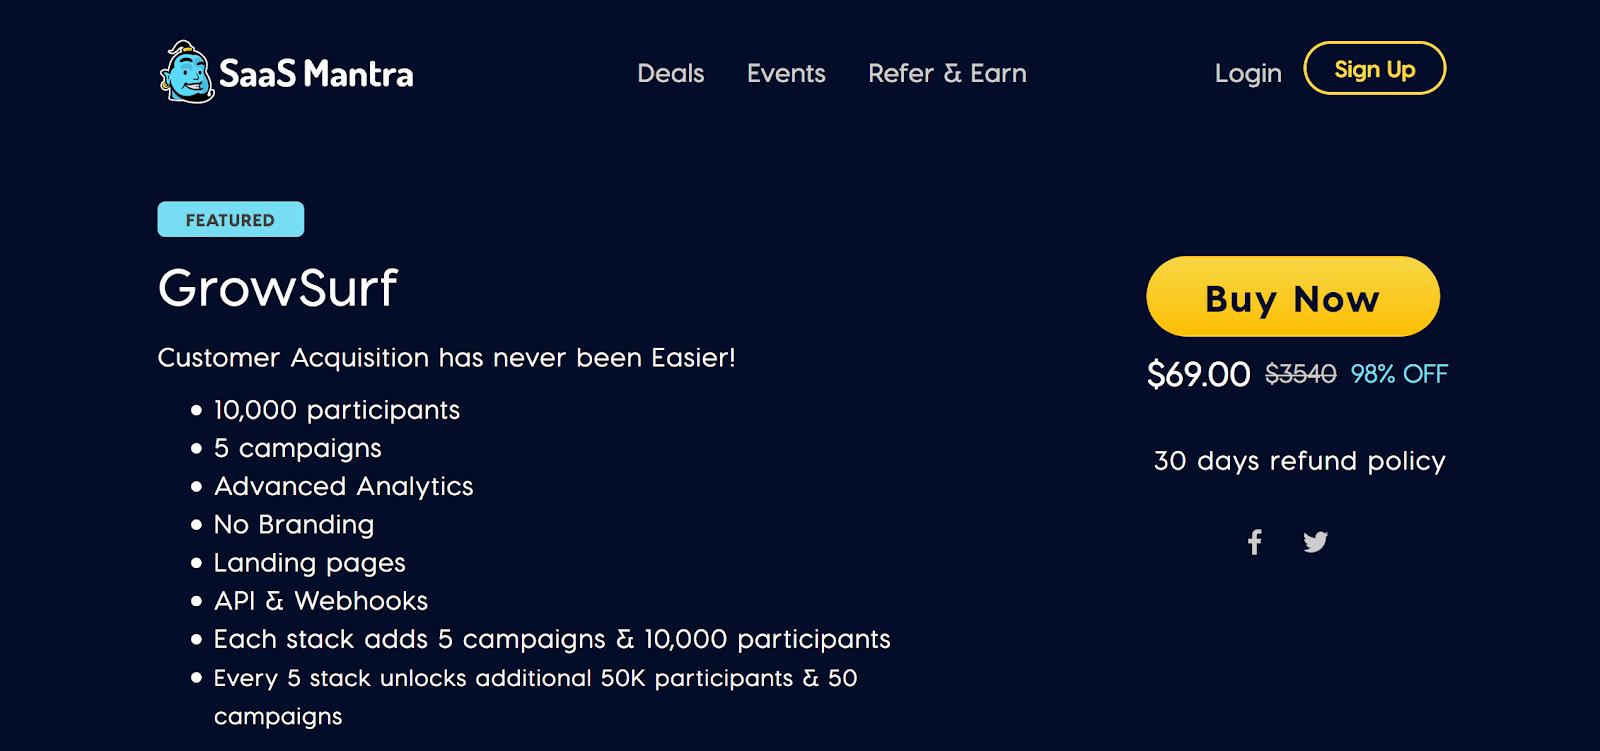 SaaS Mantra - Influencer Program Opportunites